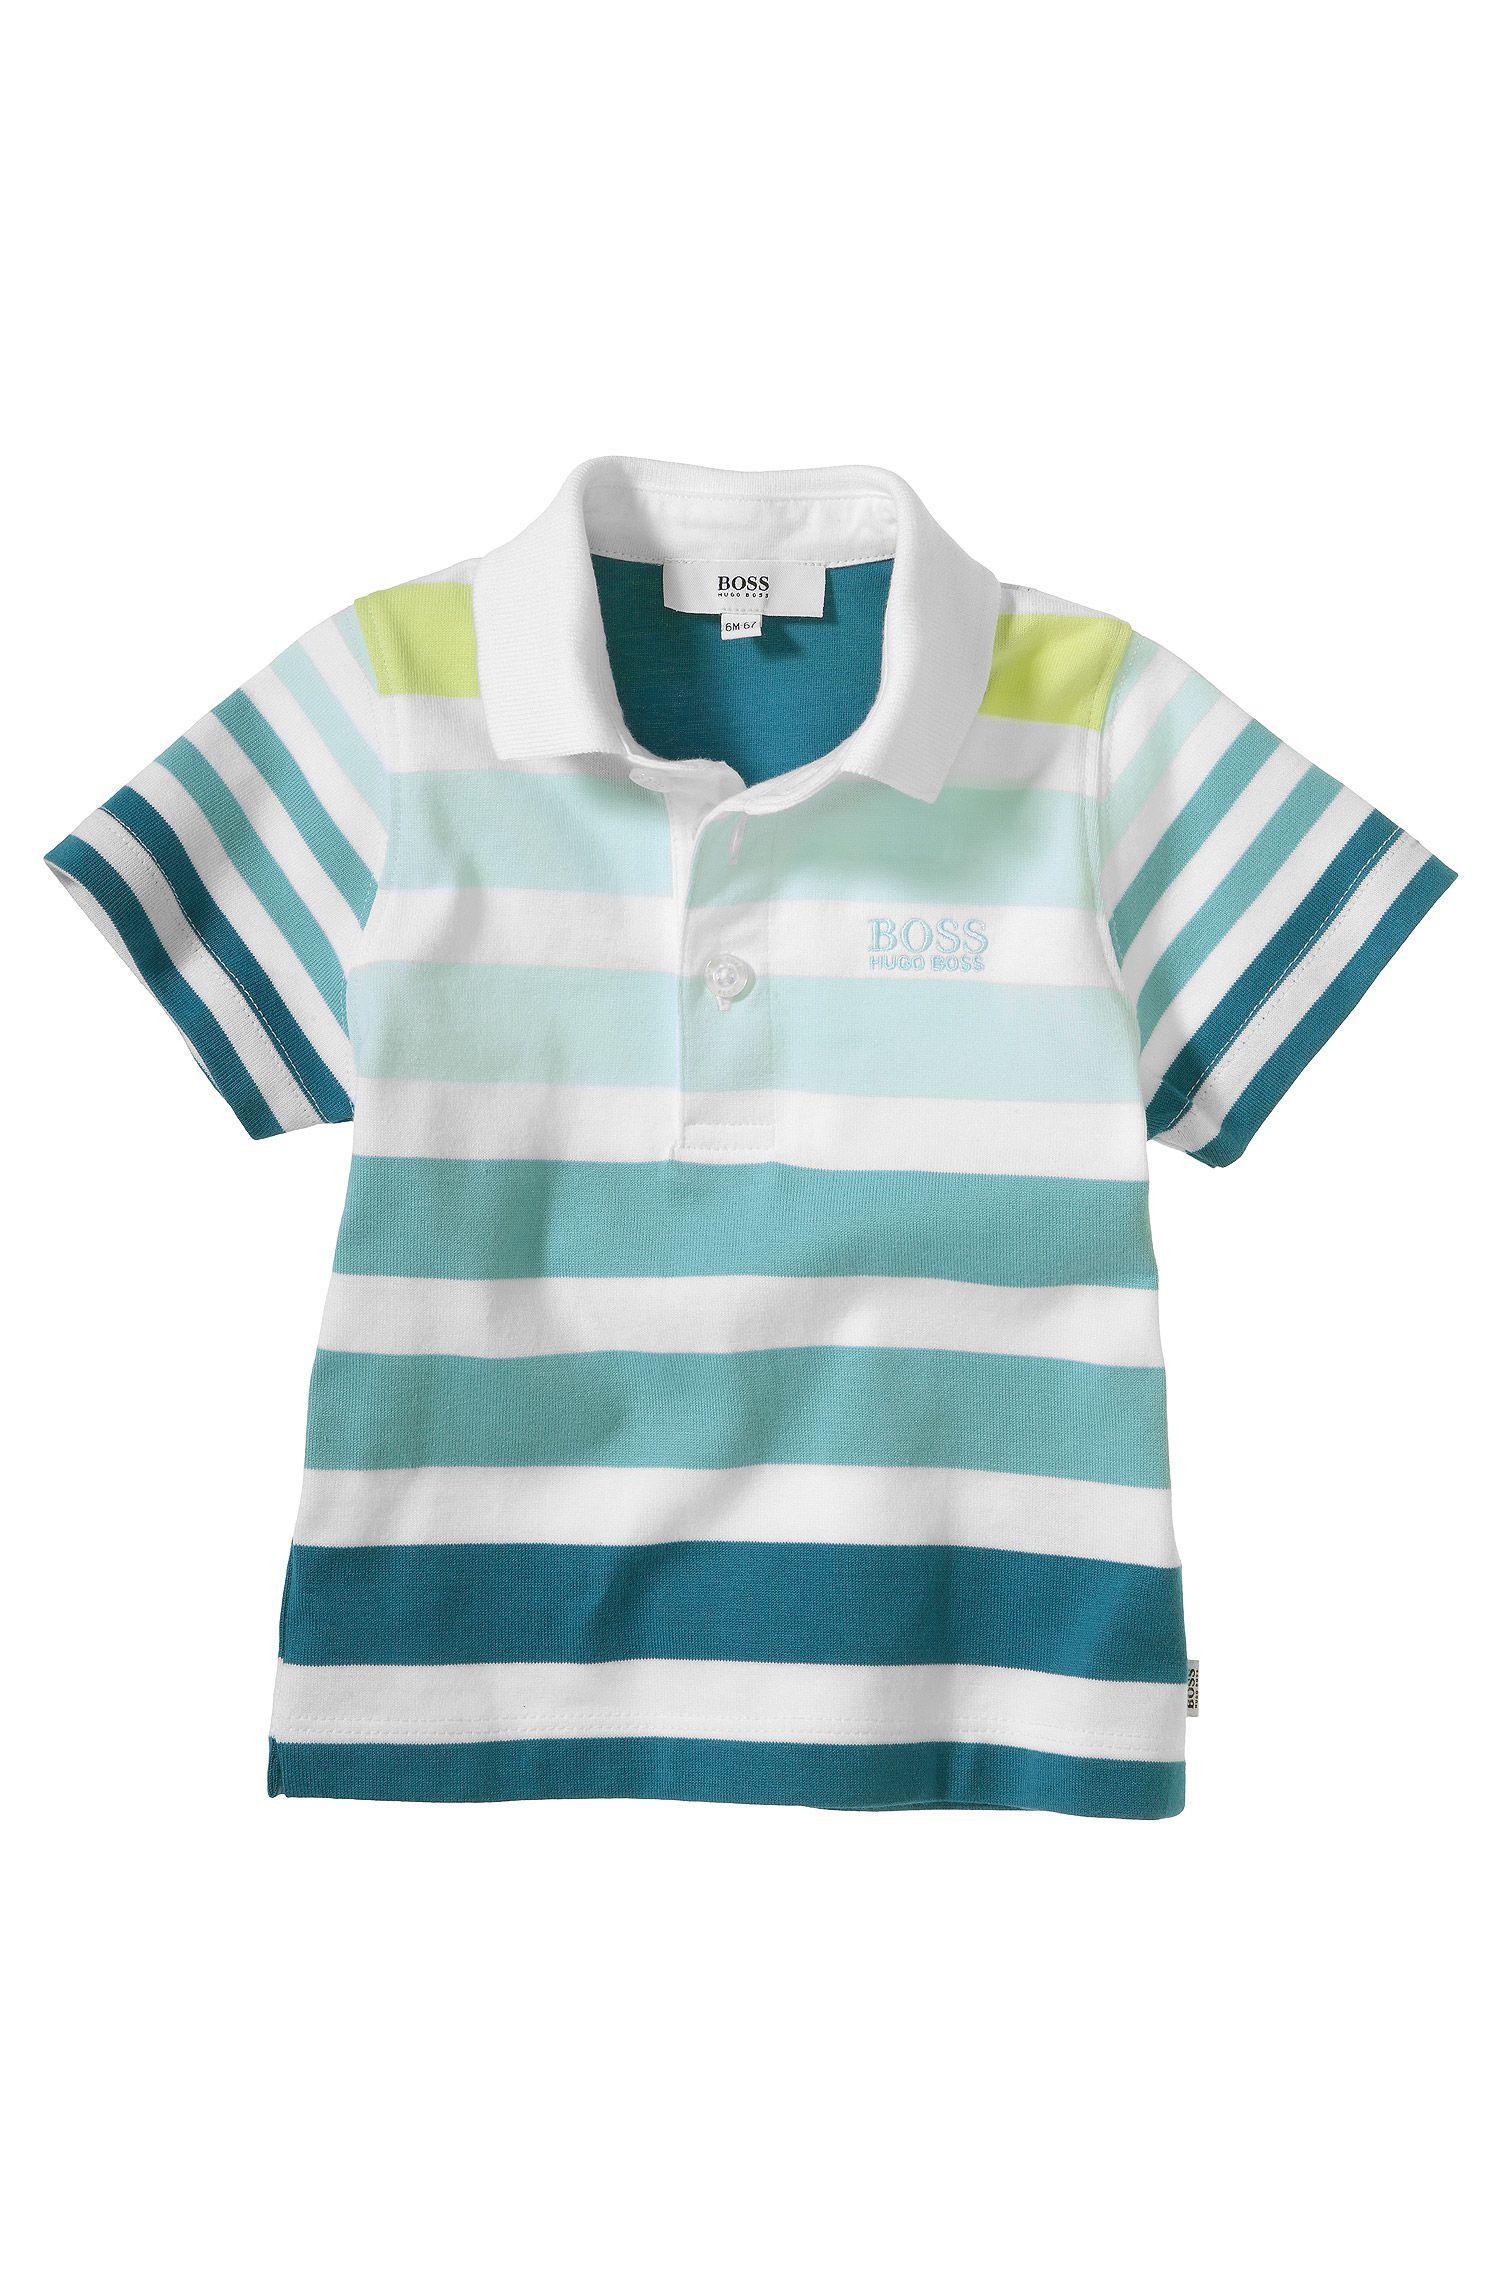 Kids-Polo ´J05369` aus Baumwolle